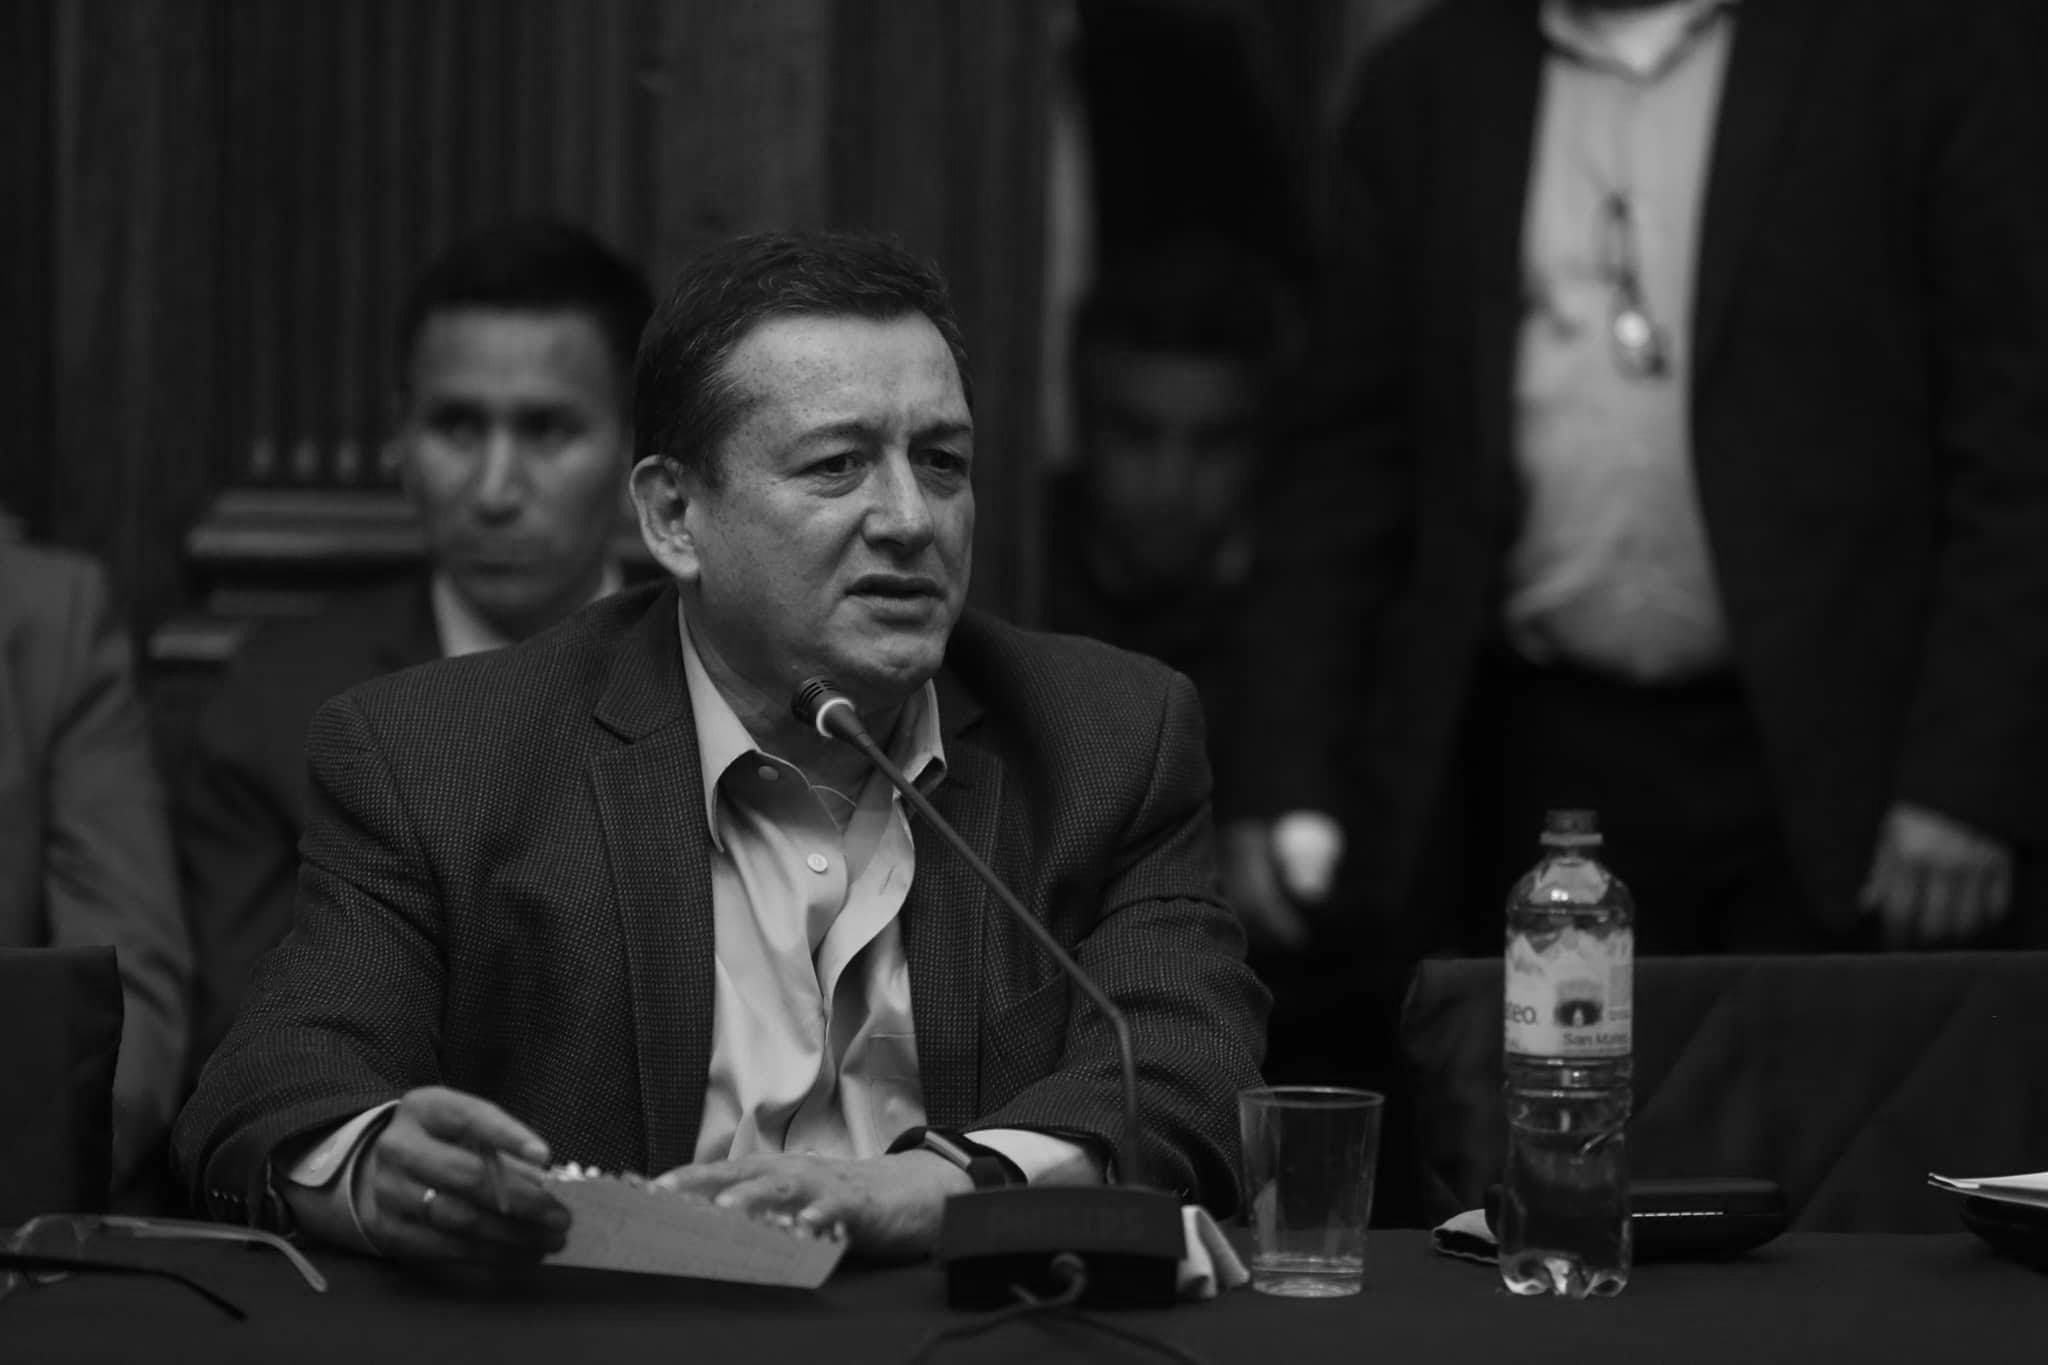 Rolando Reátegui: ¿Por qué le preguntaron si había ingerido alcohol? [Video]